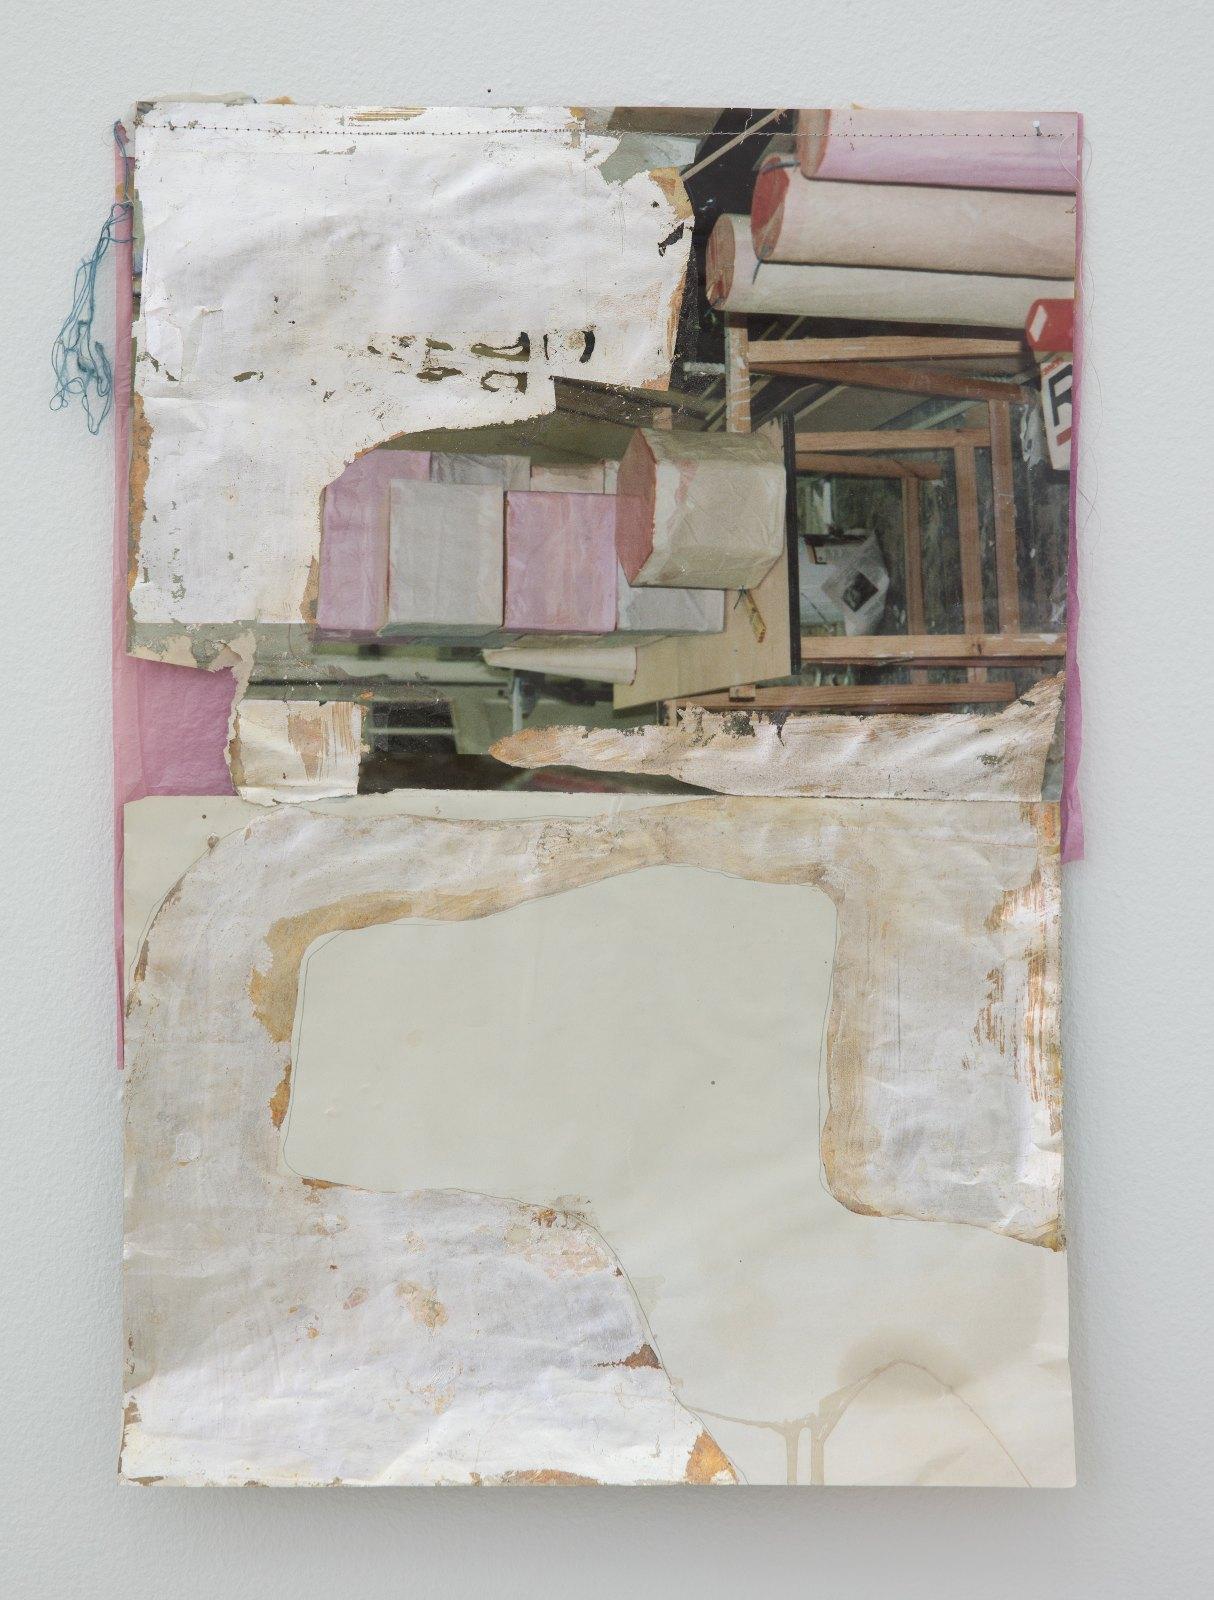 Bonfire burns, 2014, offset print, silver, sewing and tissuepaper, 54 x 40,5 cm